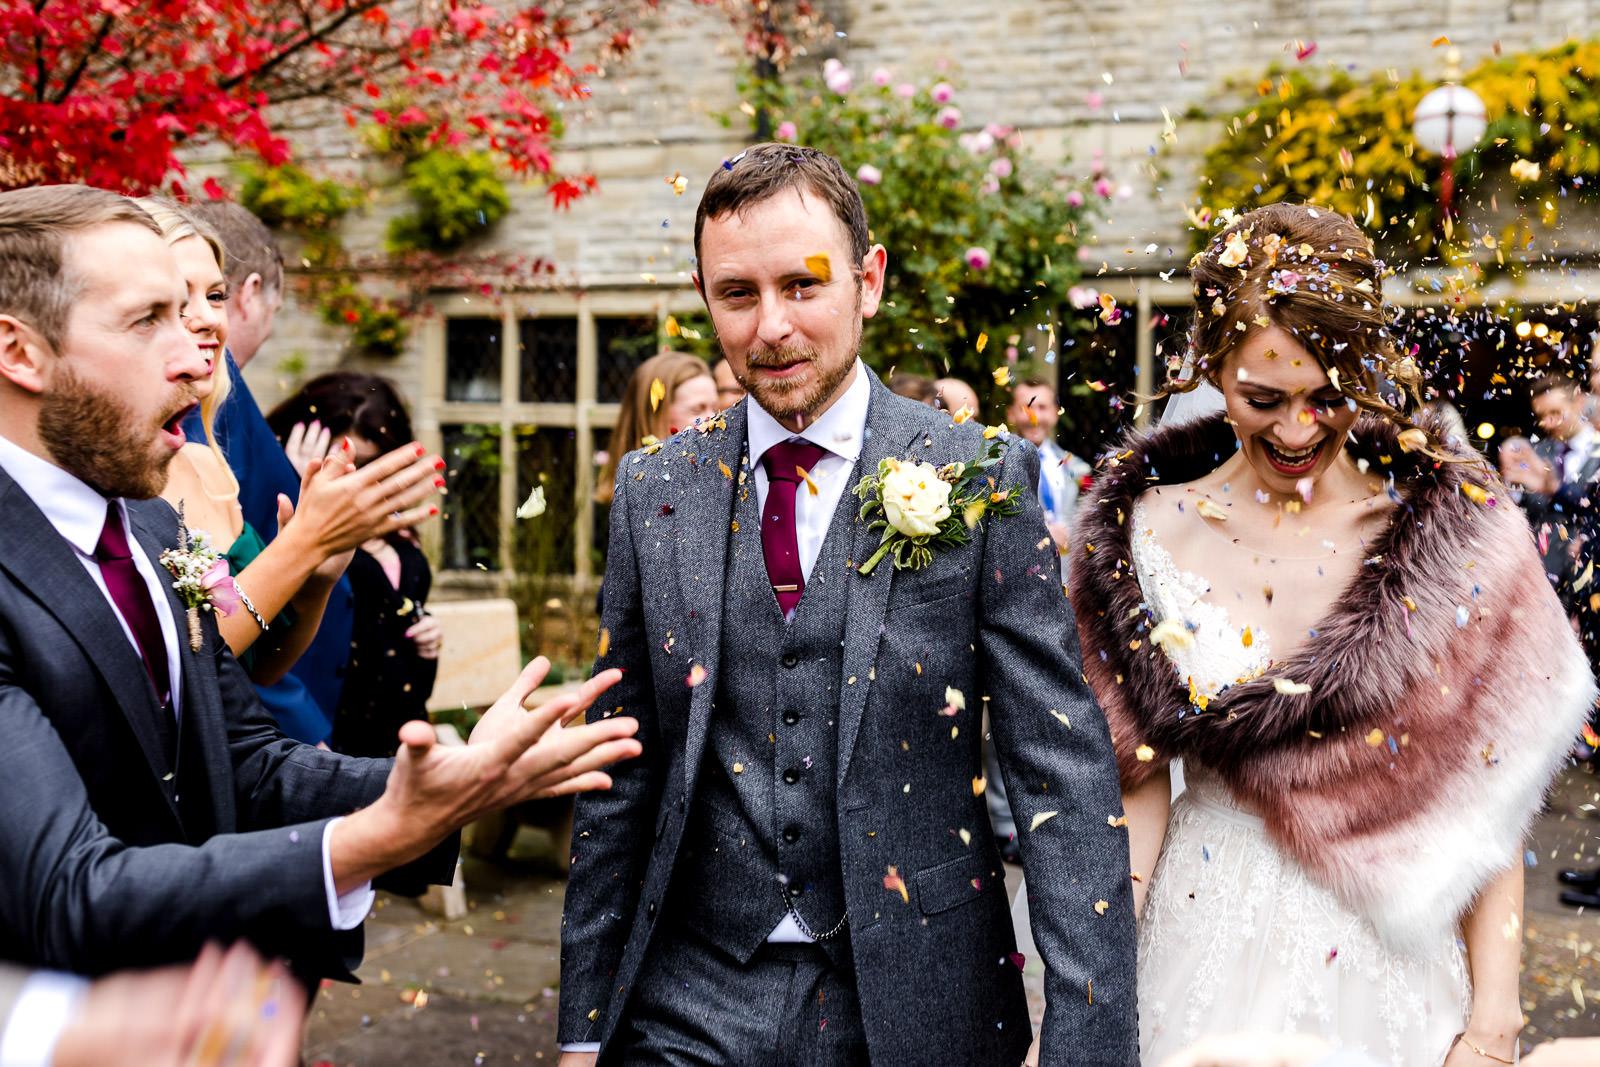 Miskin Manor Wedding Photography - Art by Design Photography - Confetti